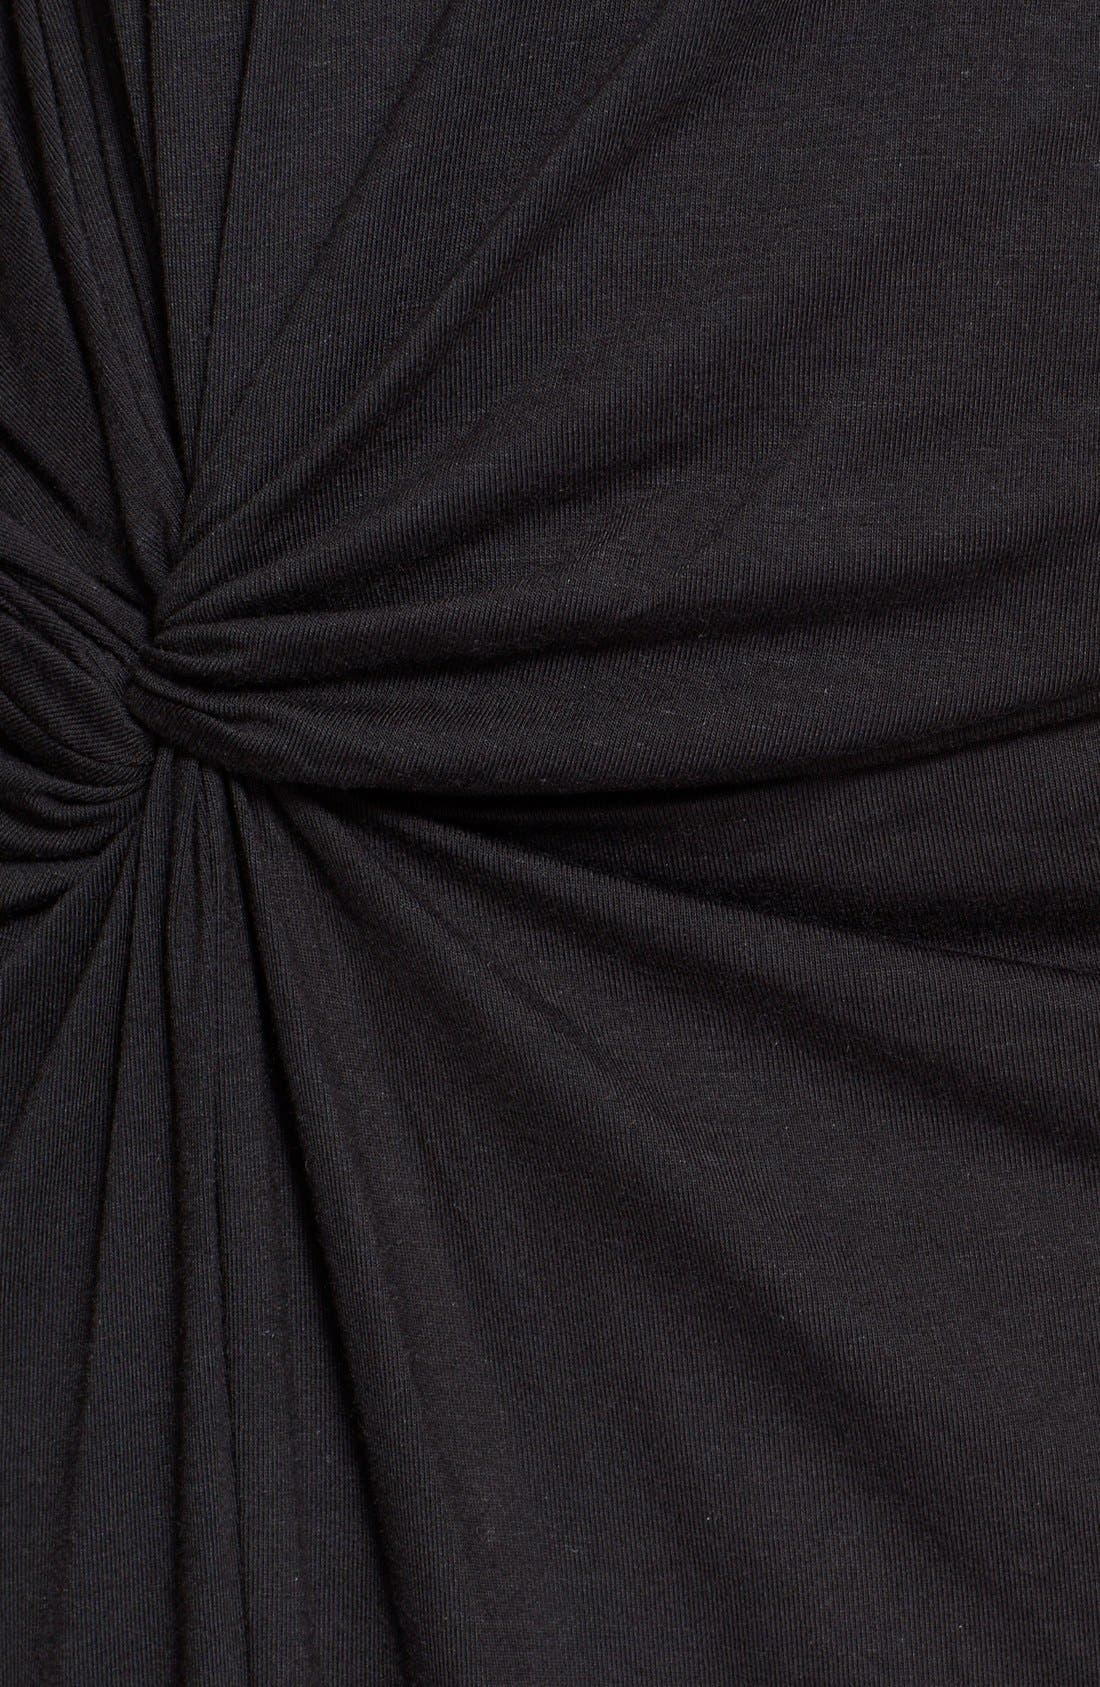 Alternate Image 3  - Elizabeth and James 'Marine' Side Knot Midi Jersey Dress